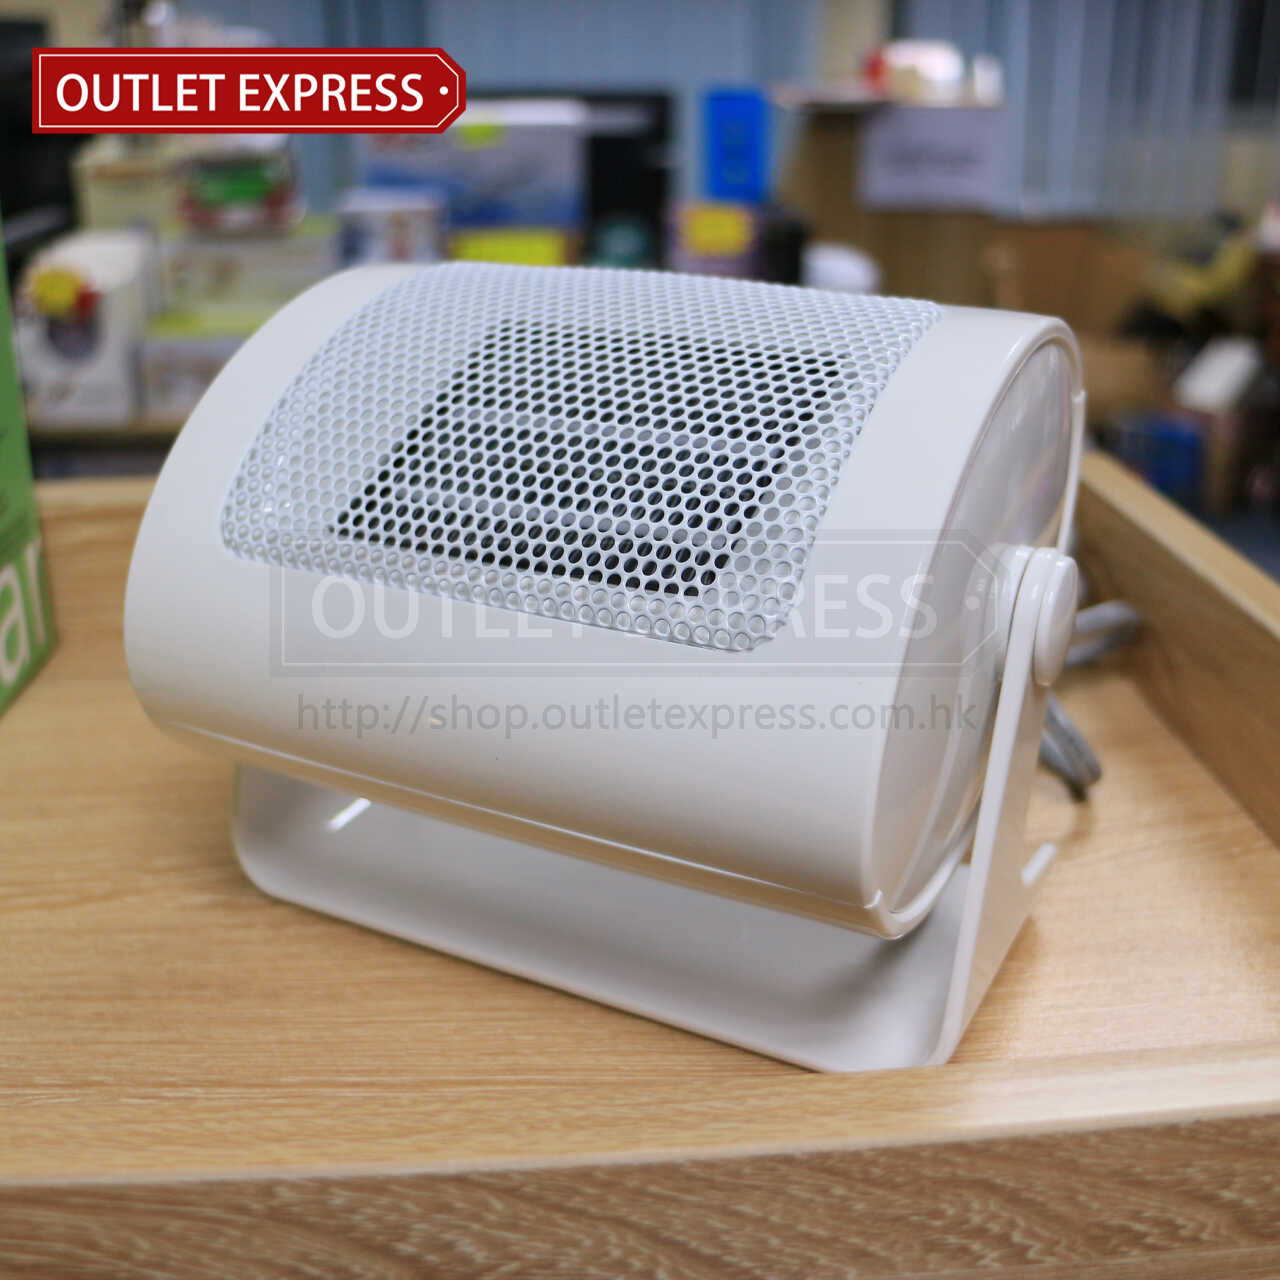 INNOTEC IH-3638 迷你桌面陶瓷暖風機 | 陶瓷暖爐  - Outlet Express HK生活百貨城實拍相片